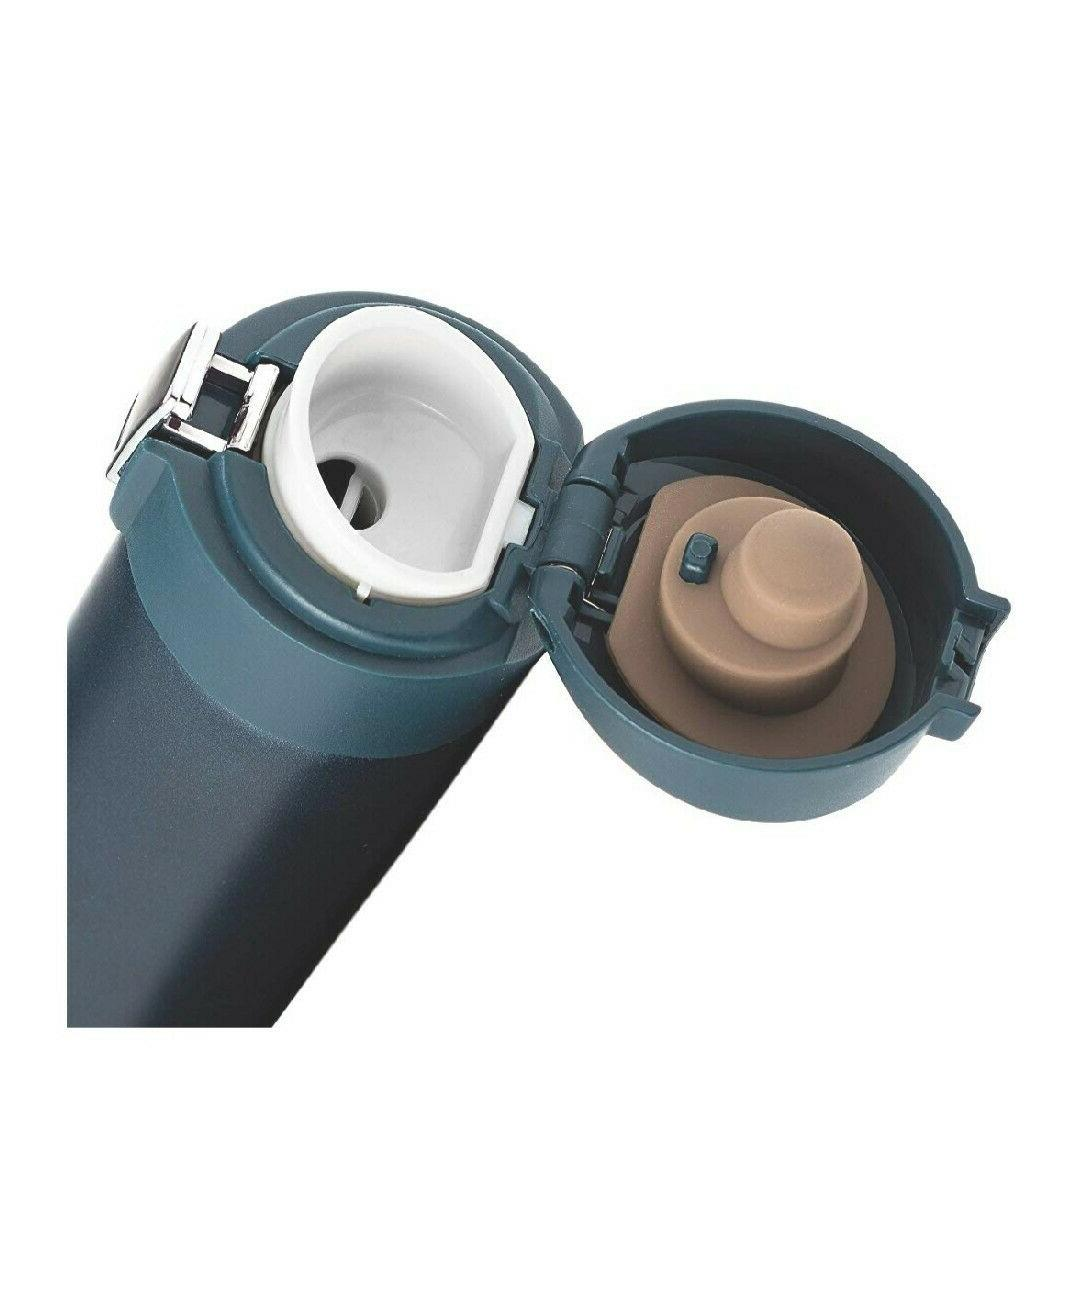 coffee thermos Bottle, Mug